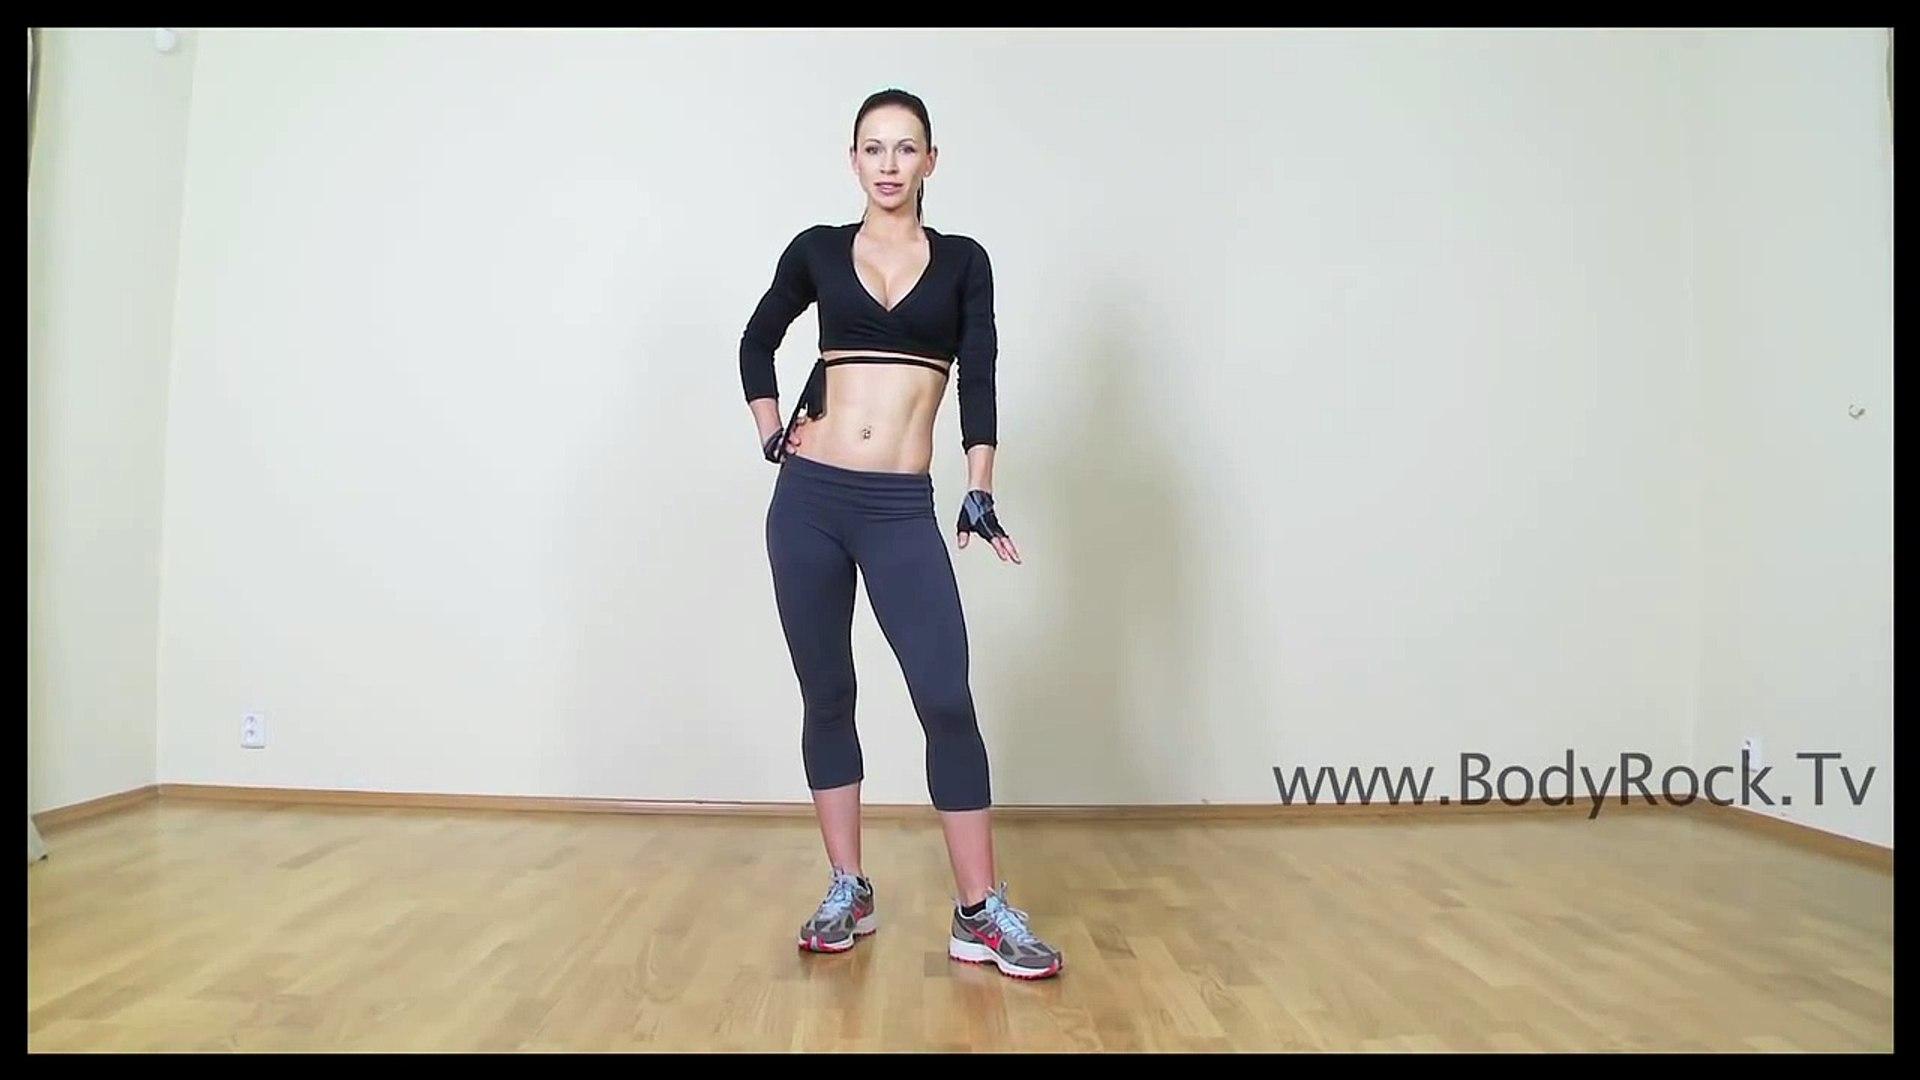 ZUZANA LIGHT - BODYROCKTV - SIDE LUNGE LEG EXERCISE - Fitness Muscle Female  Bodybuilding Training